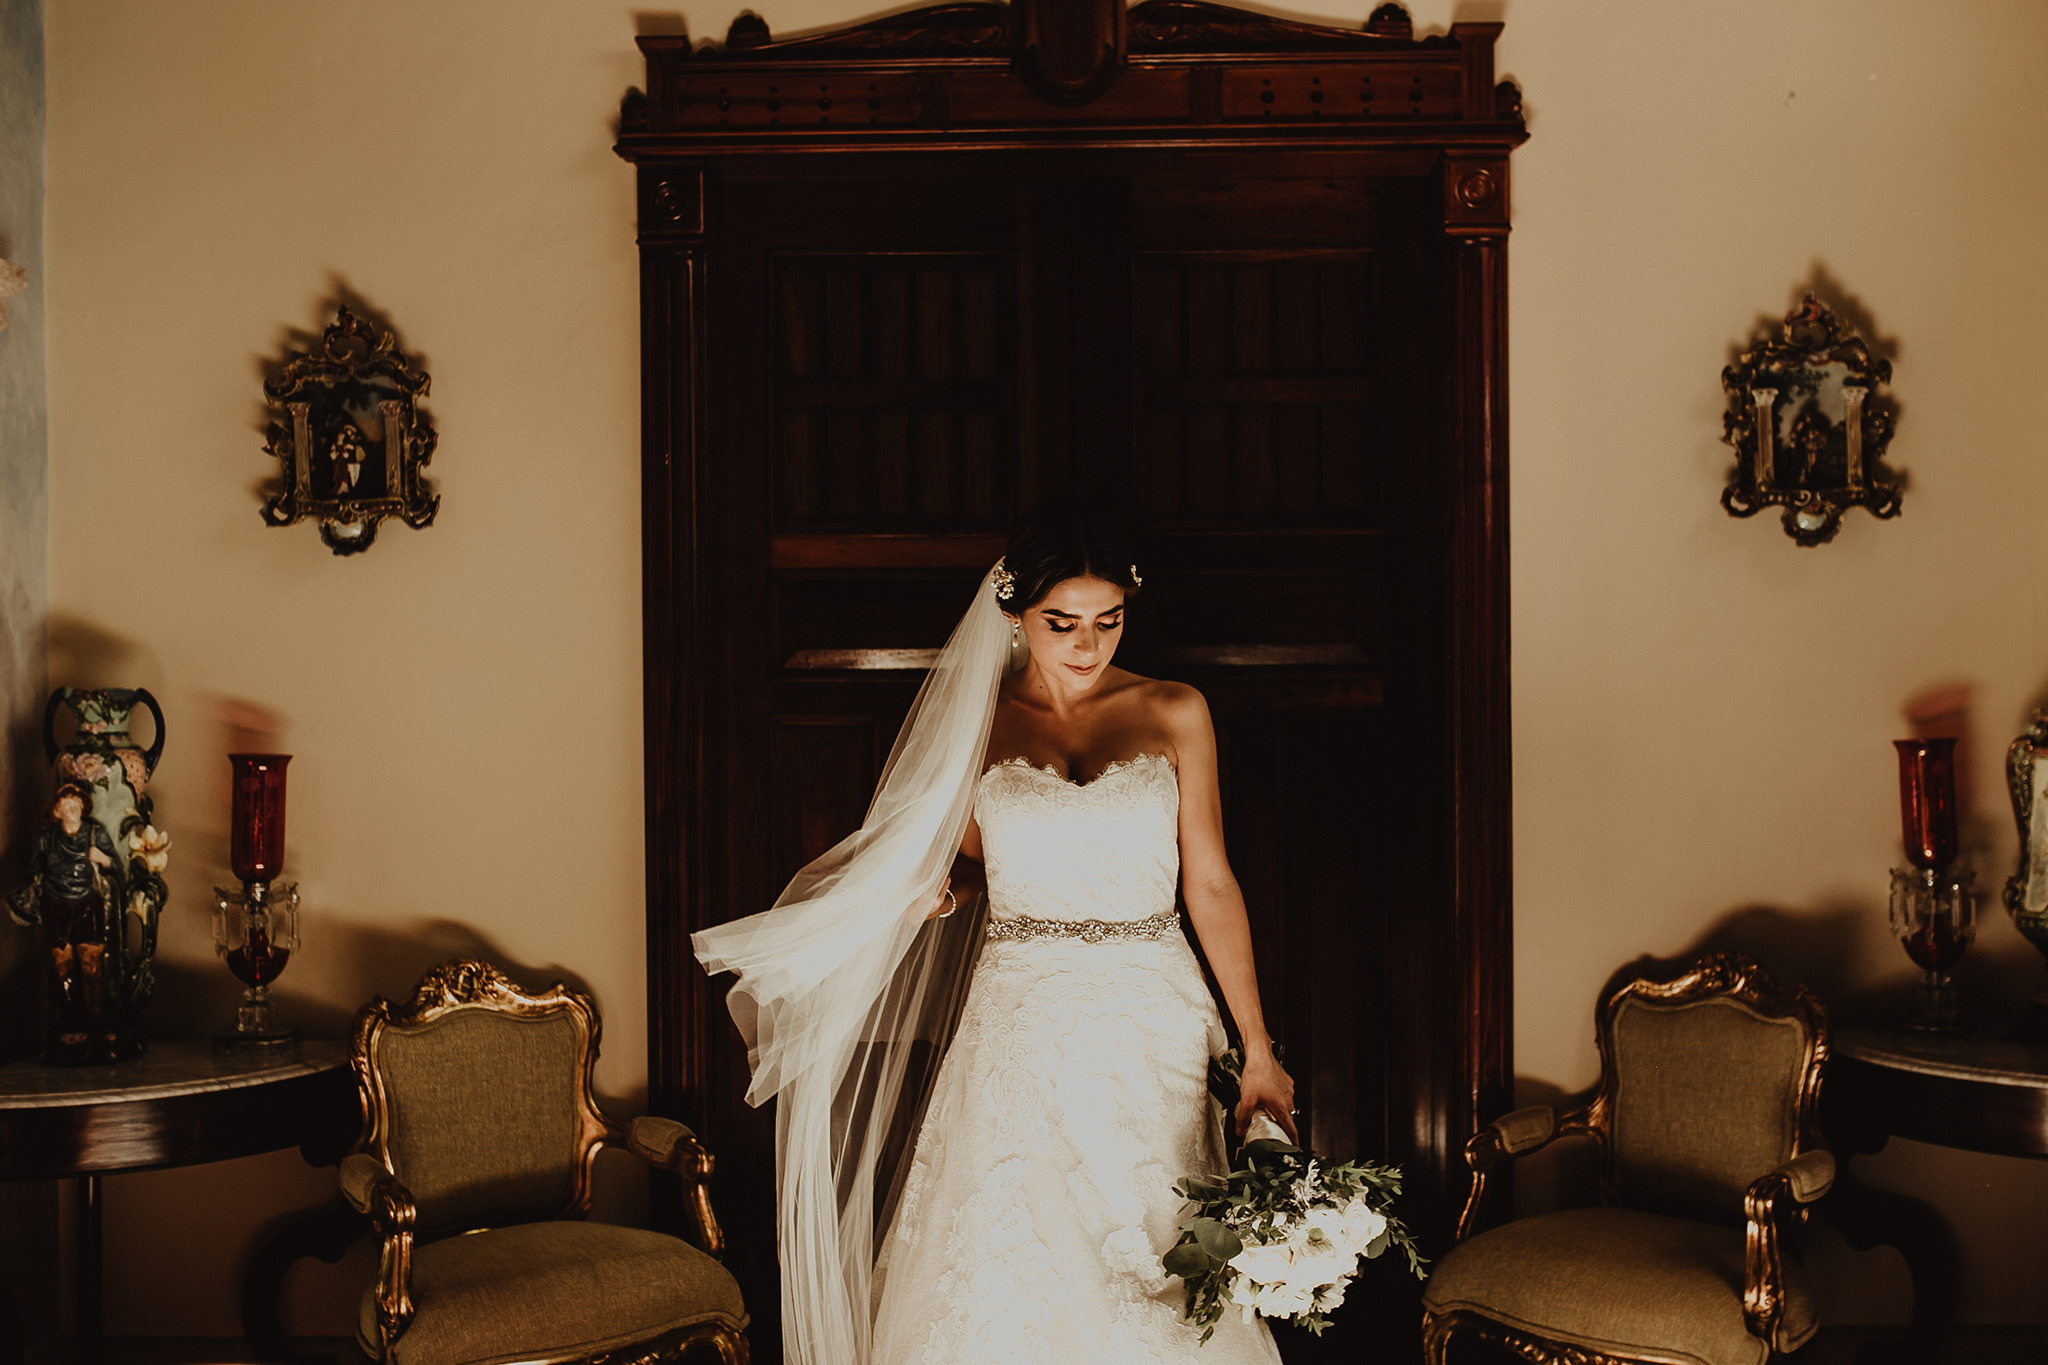 0145F&Yslide_WeddingDstination_MeridaYucatan_HaciendasMerida_BodasMexico_BodasYucatan_Boda_Destino.jpg